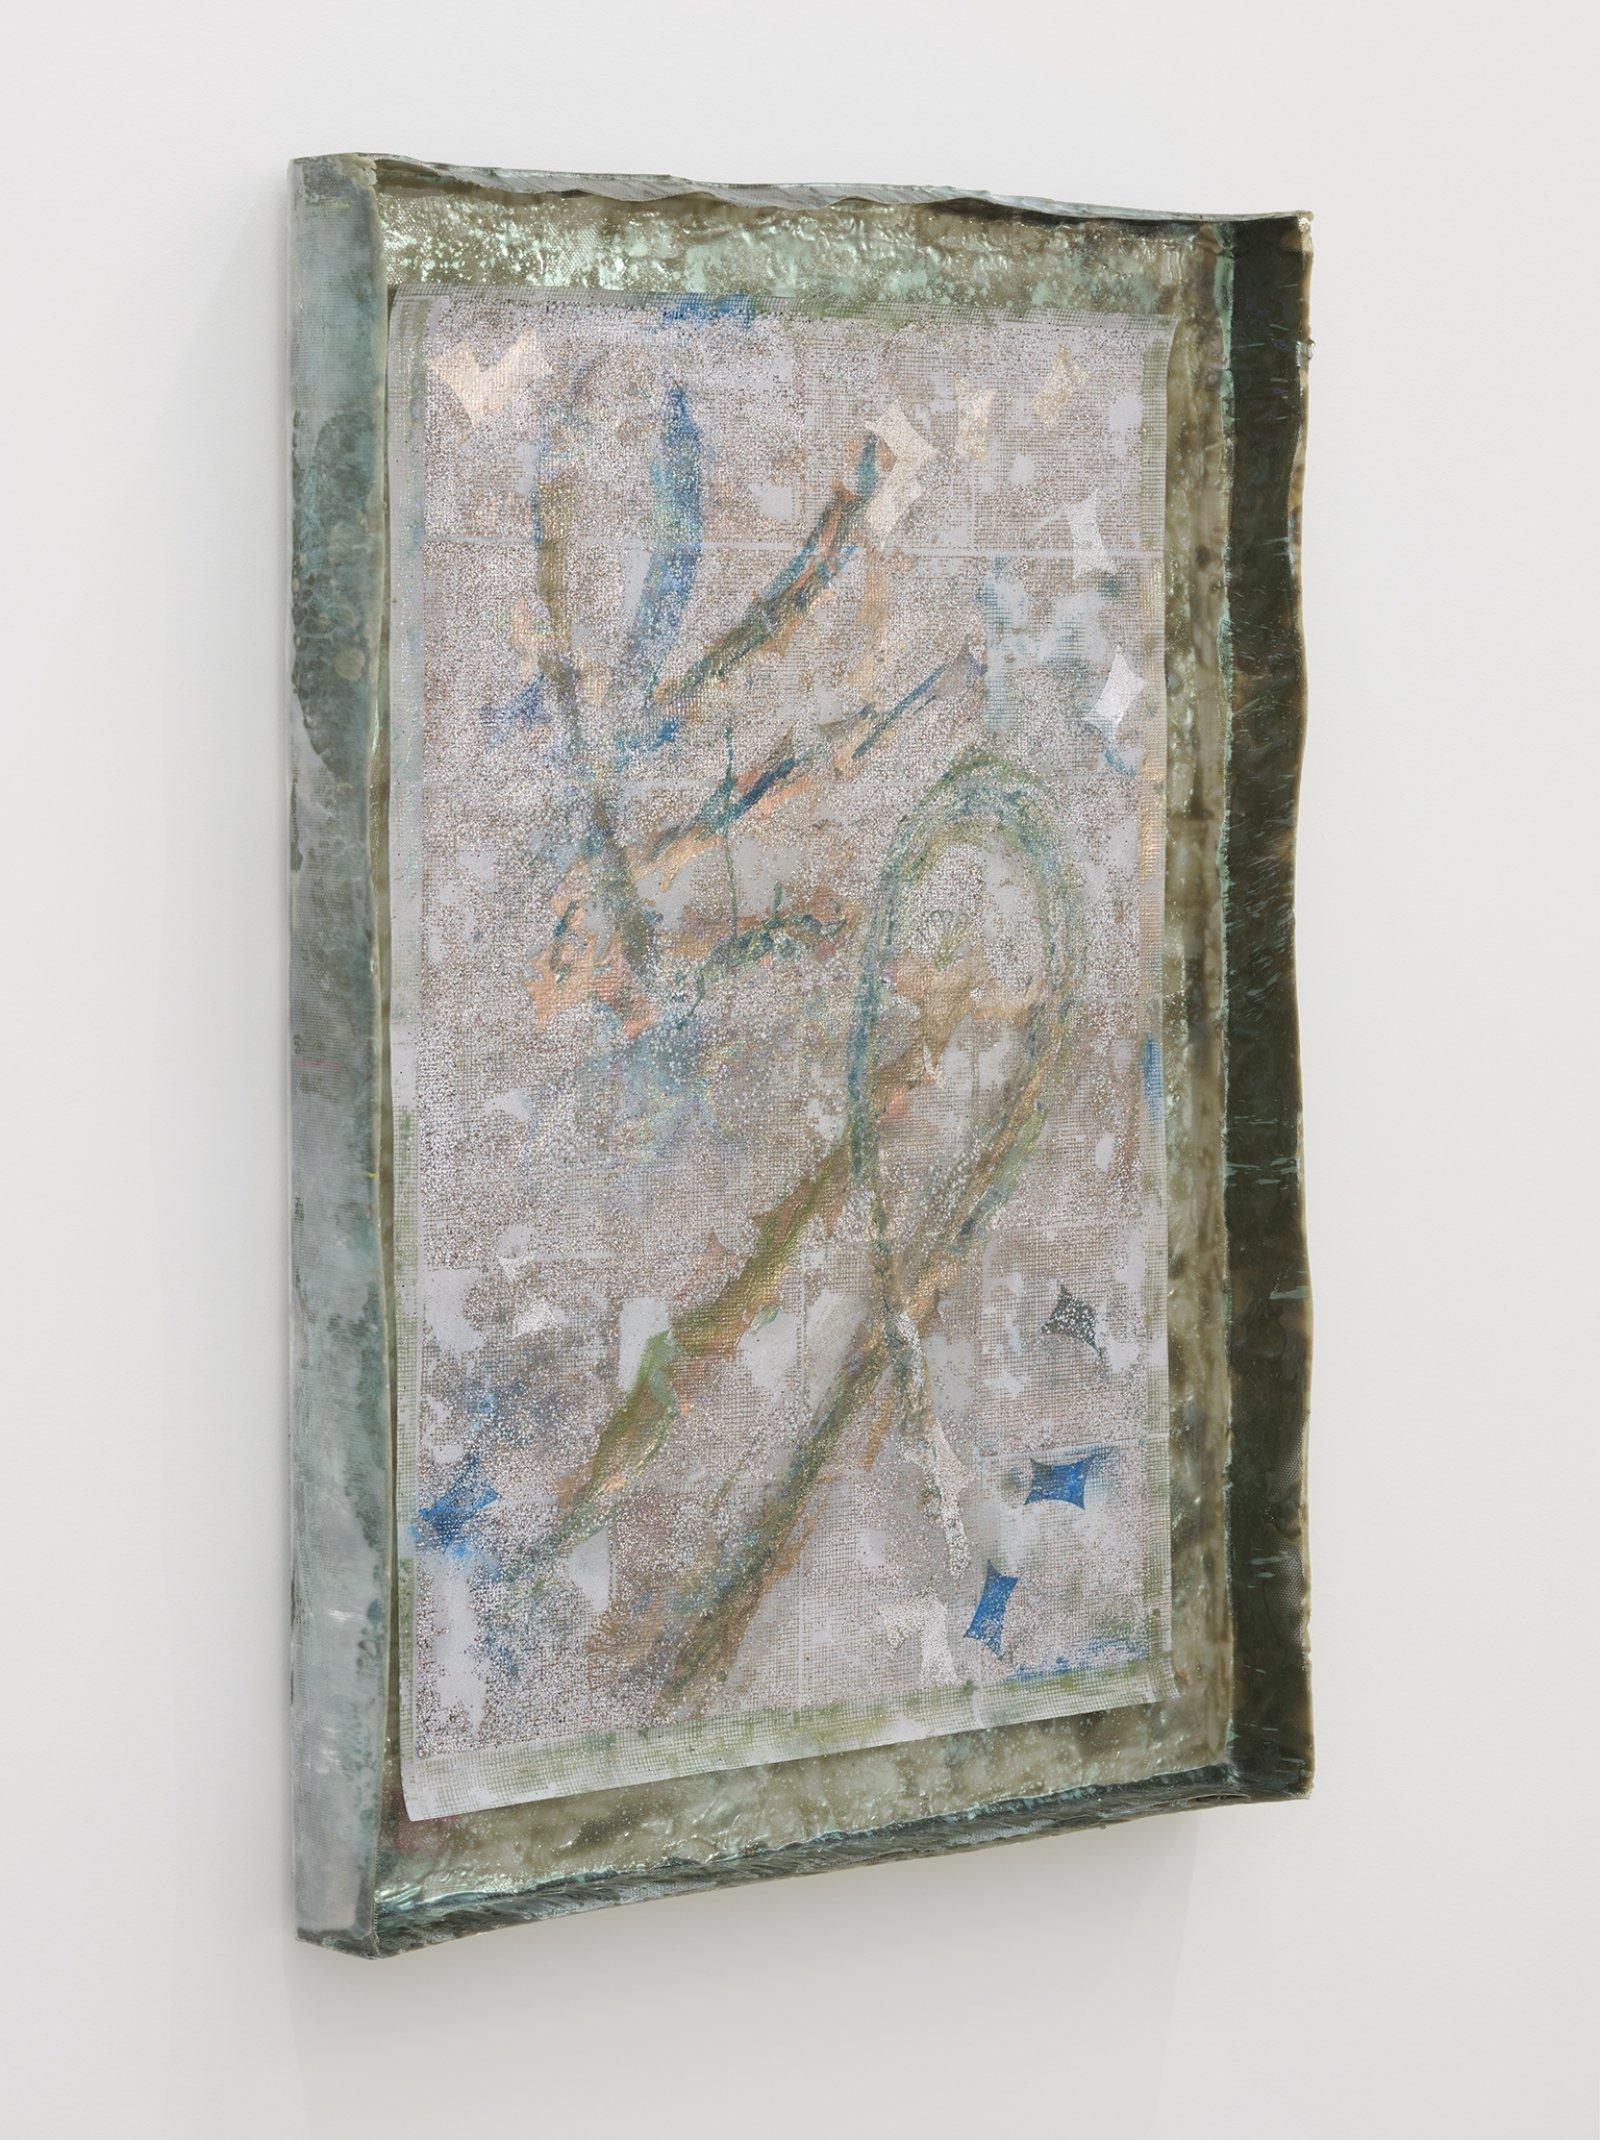 Rebecca Brewer, Live Resin: Twin Flame, 2019, urethane resin, aluminum mesh, pigment, plexiglas, embossing powder on vellum, 41 x 29 in. (104 x 74 cm)